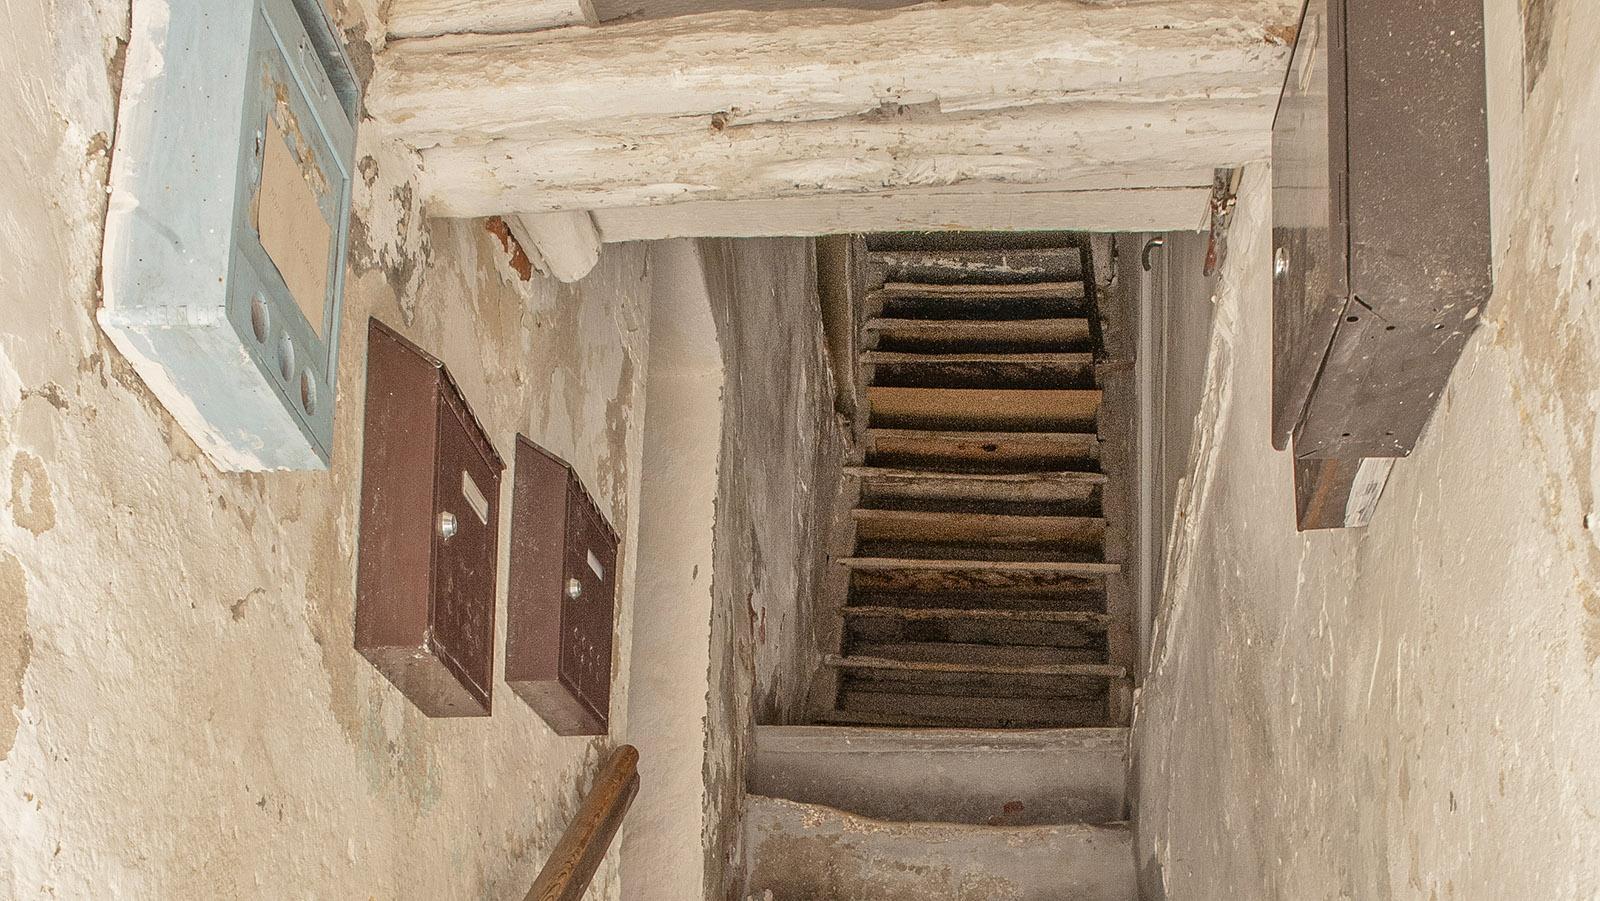 Bonifacio: Treppenhaus in der Altstadt. Foto: Hilke Maunder